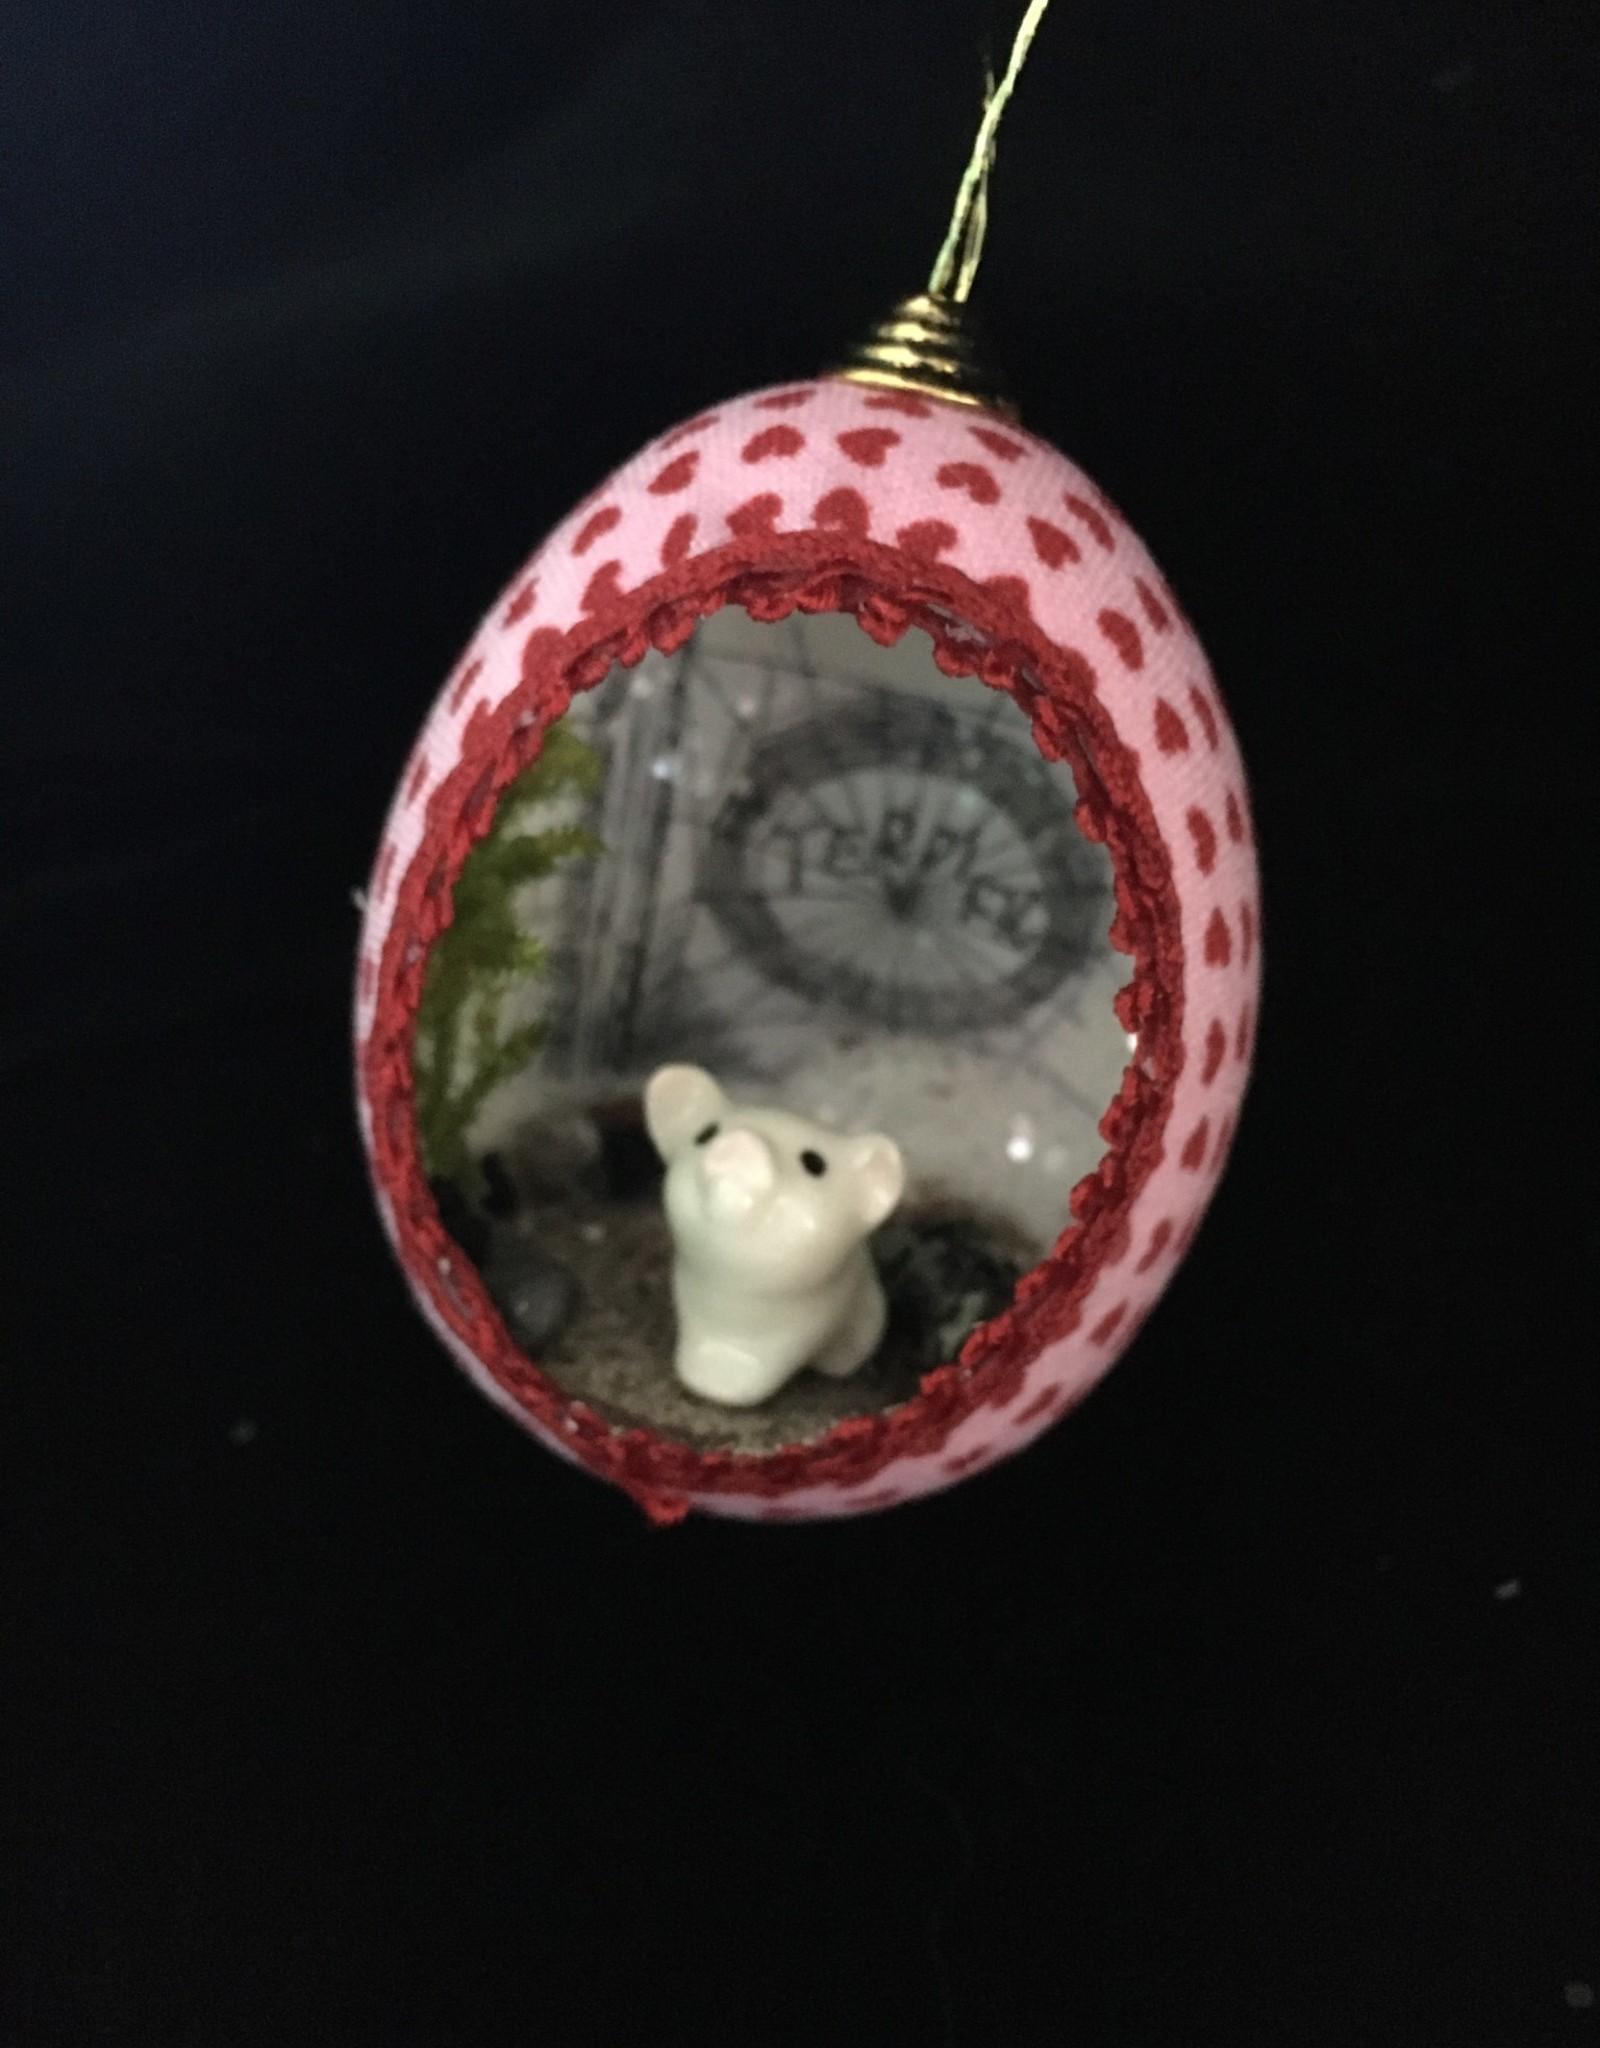 Ammi Brooks Charlotte's Web Real Egg Ornament